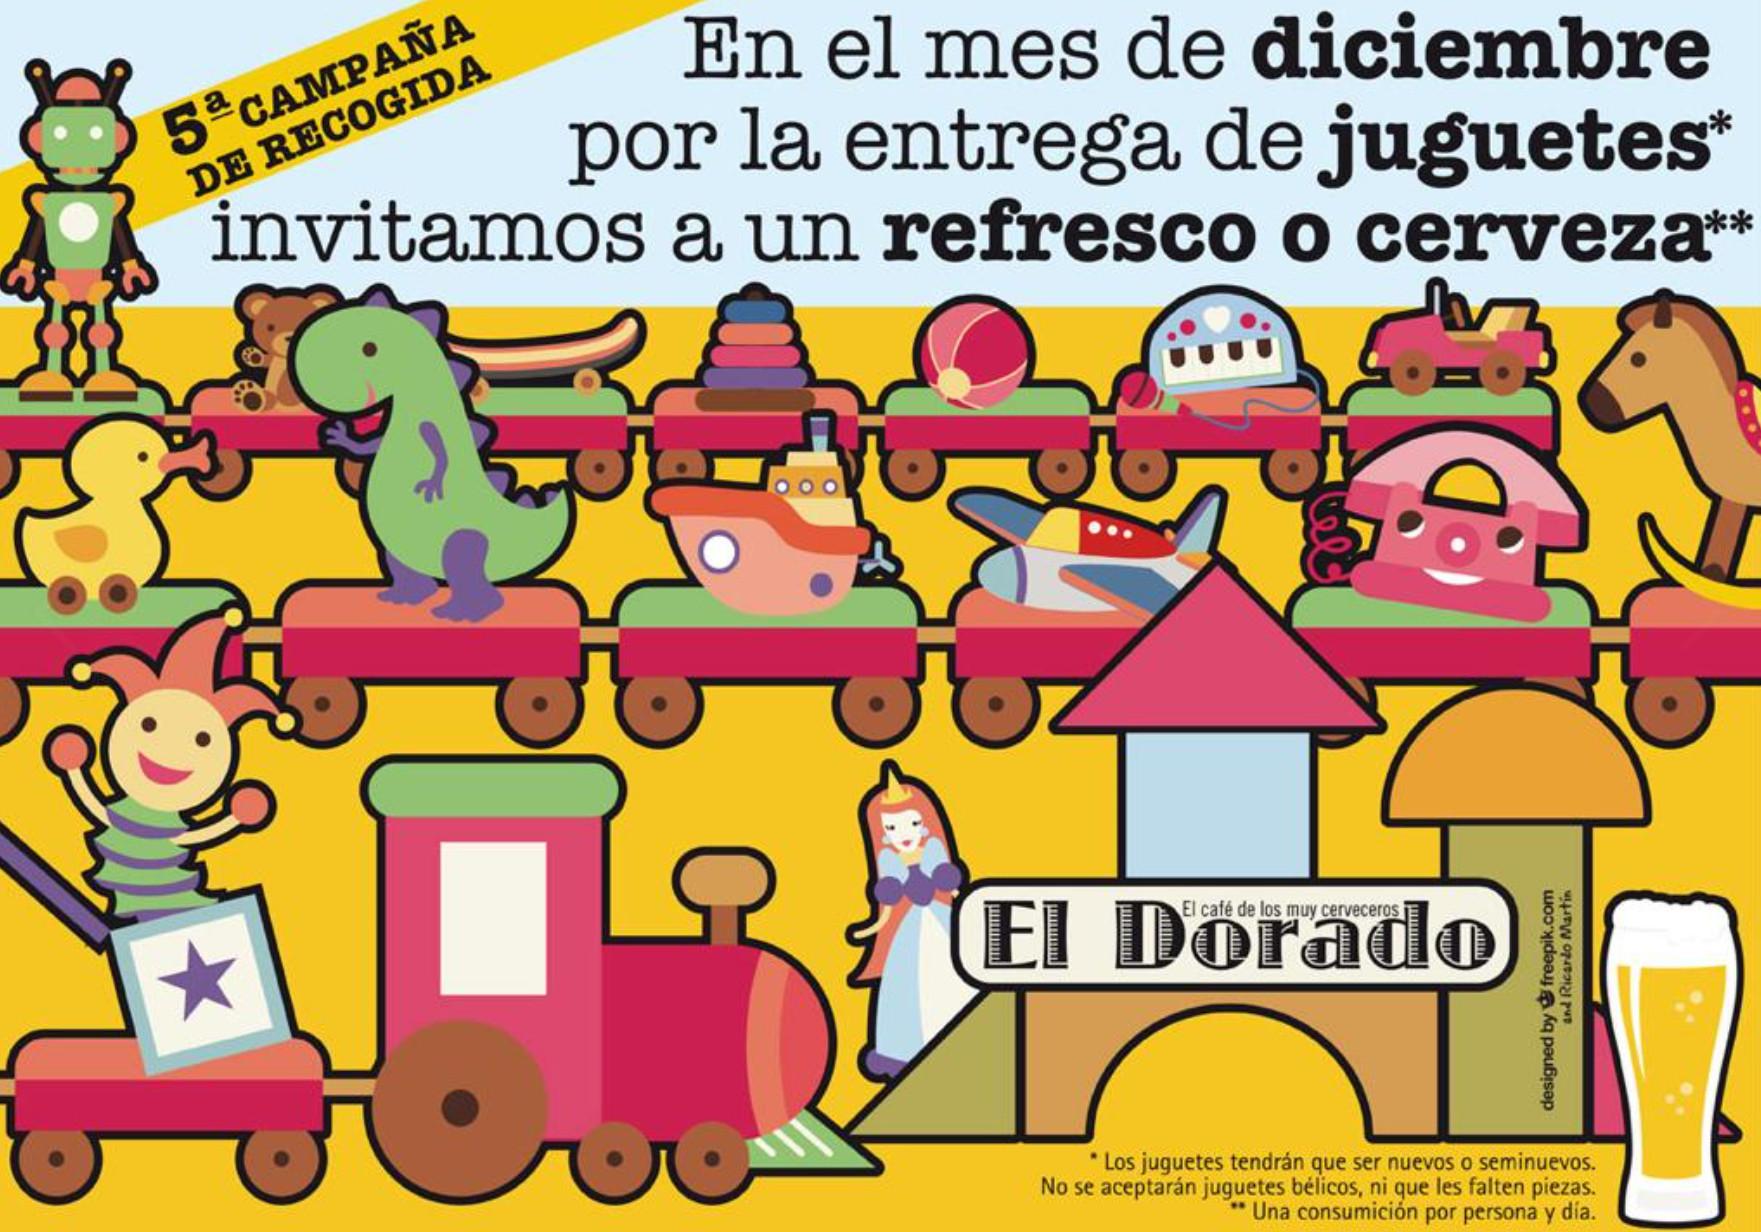 "LOGROÑO: Café Bar ""ELDORADO"" - Refresco o Cerveza gratis por la entrega de un juguete en diciembre"